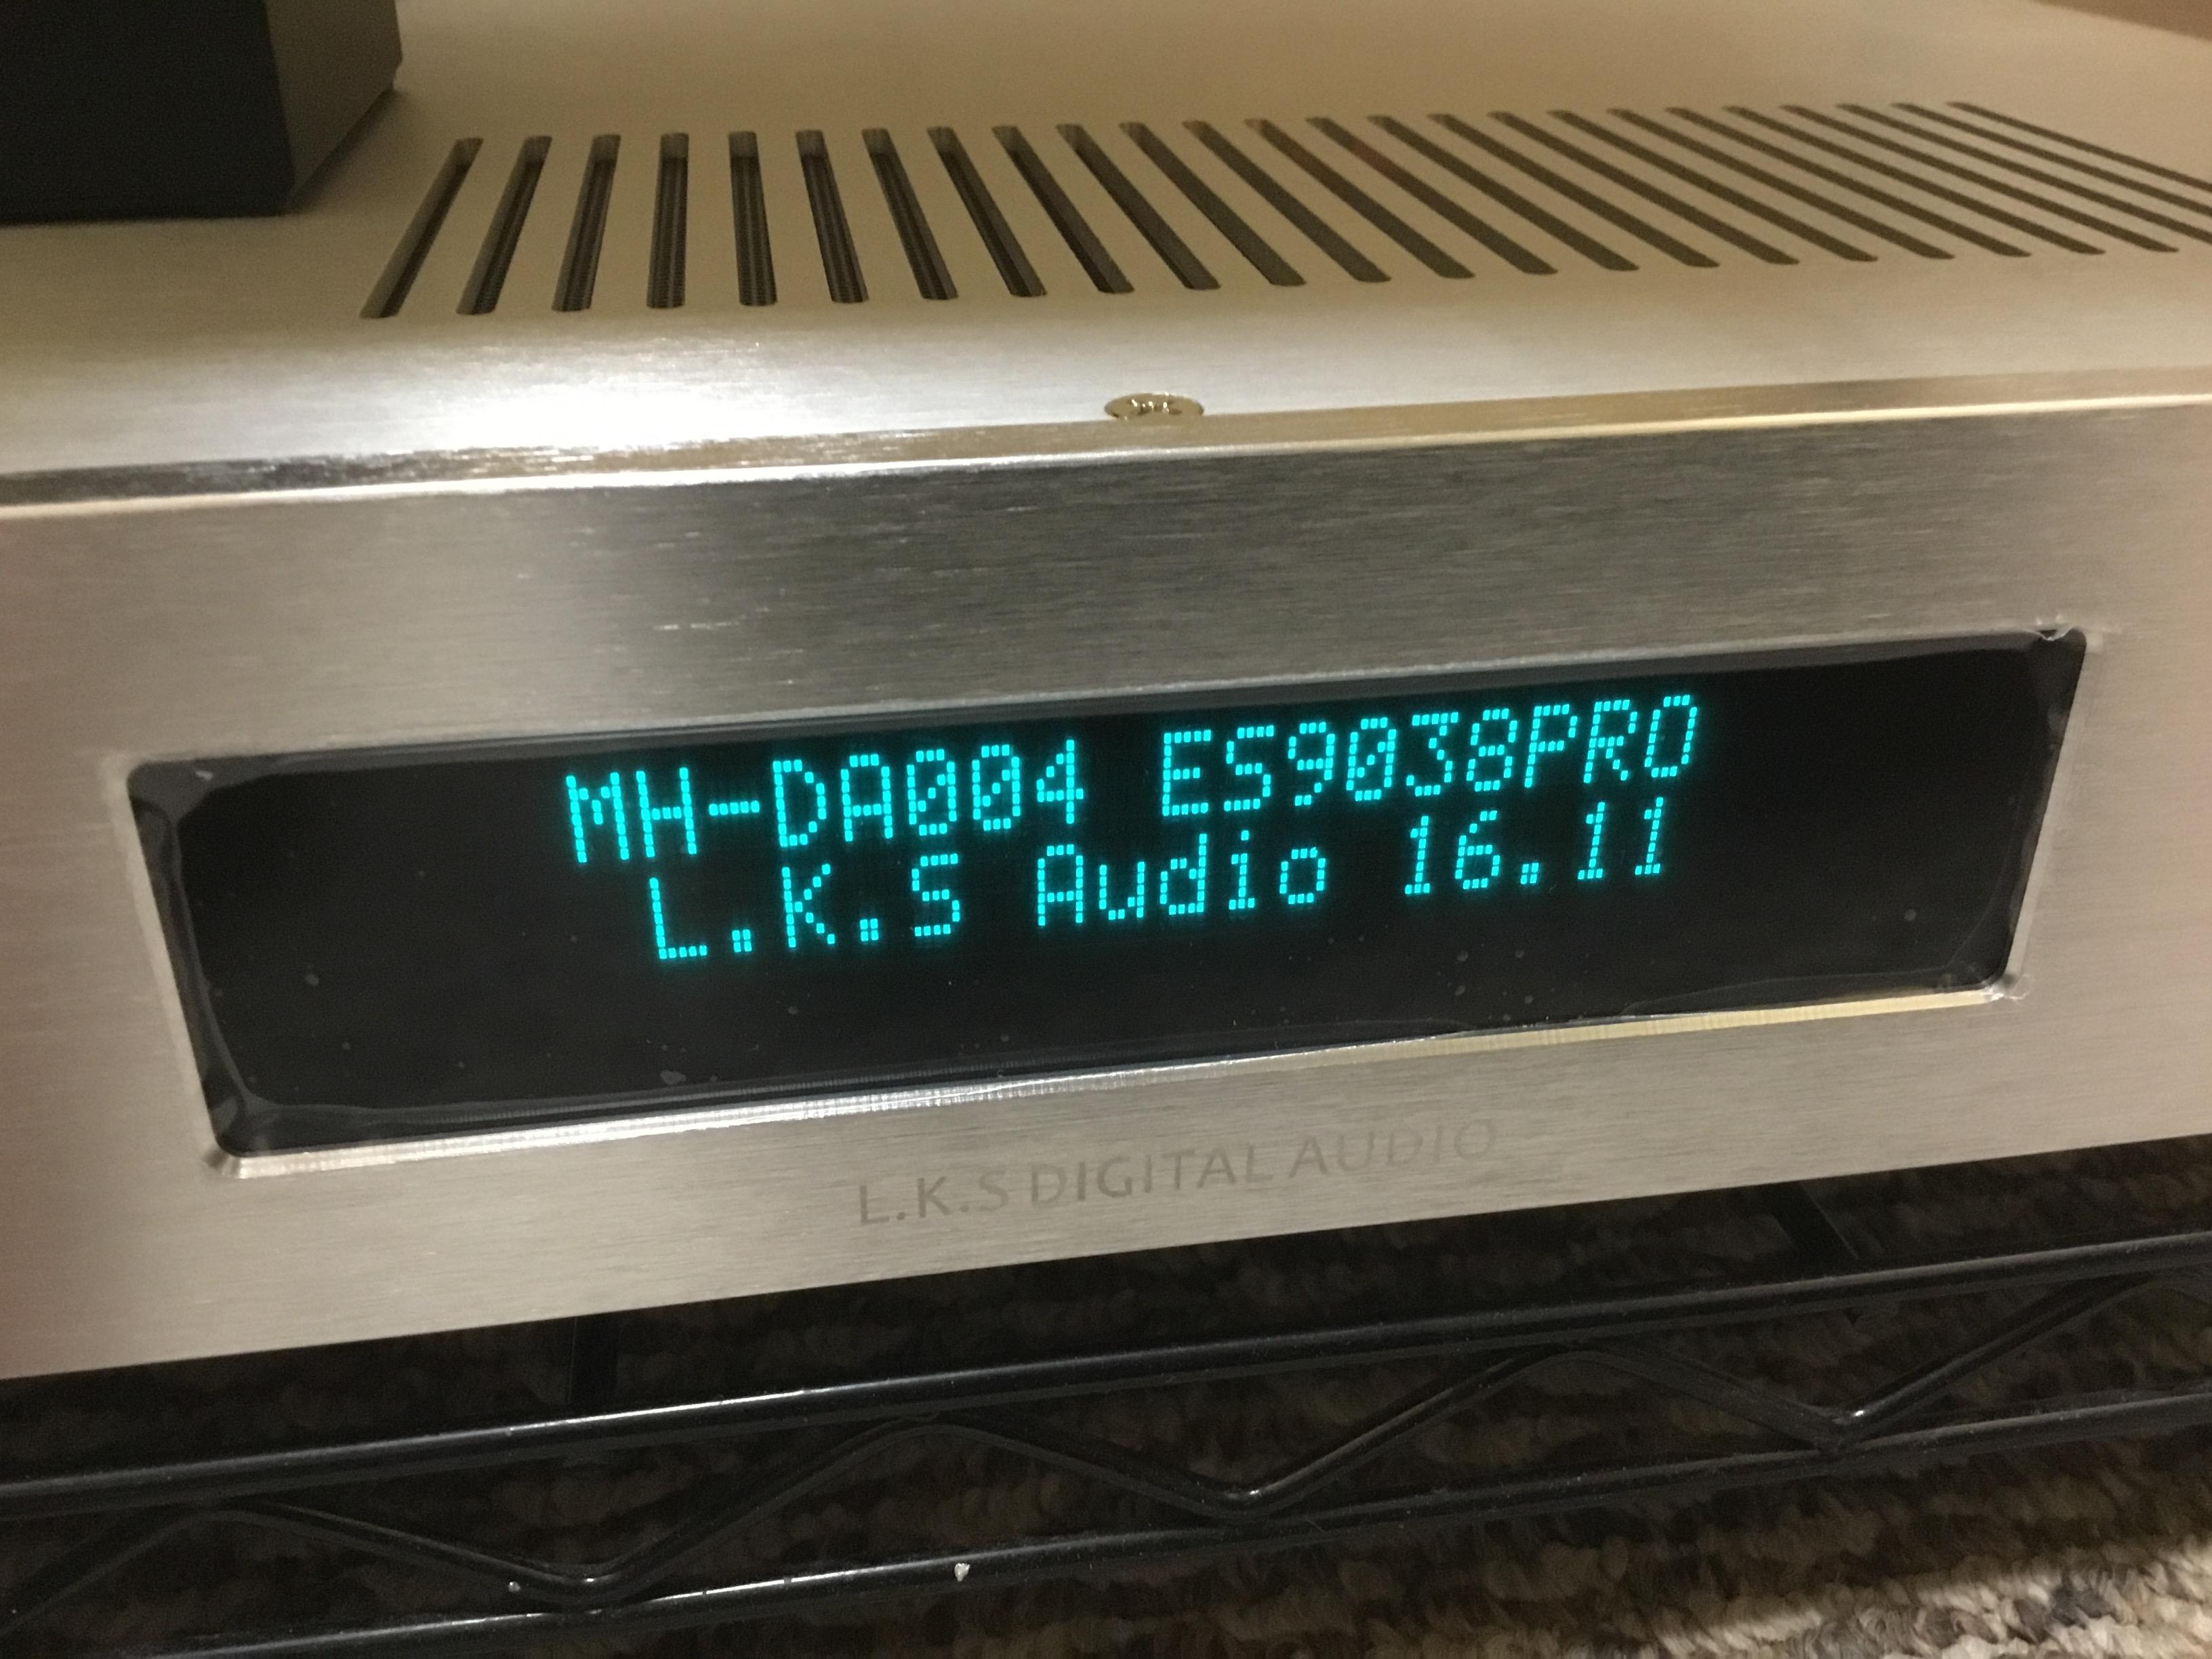 Xl 1 amp 2 12 - 1 5